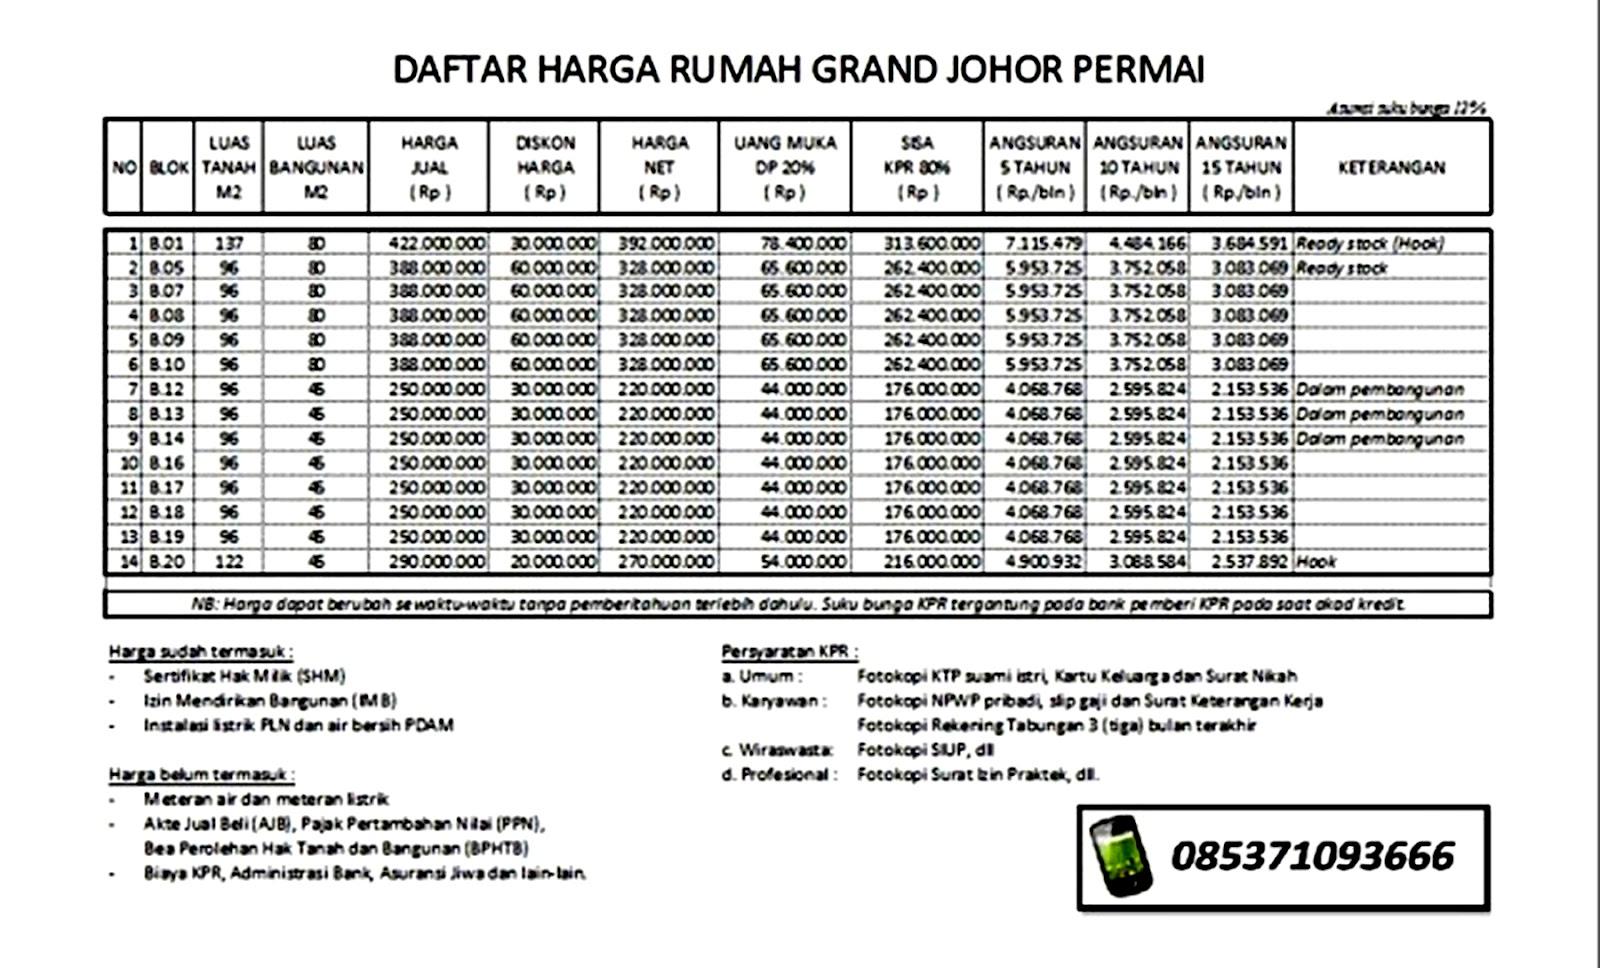 Dijual Rumah di  Medan  Johor Type 80 90 Rumah Dijual di